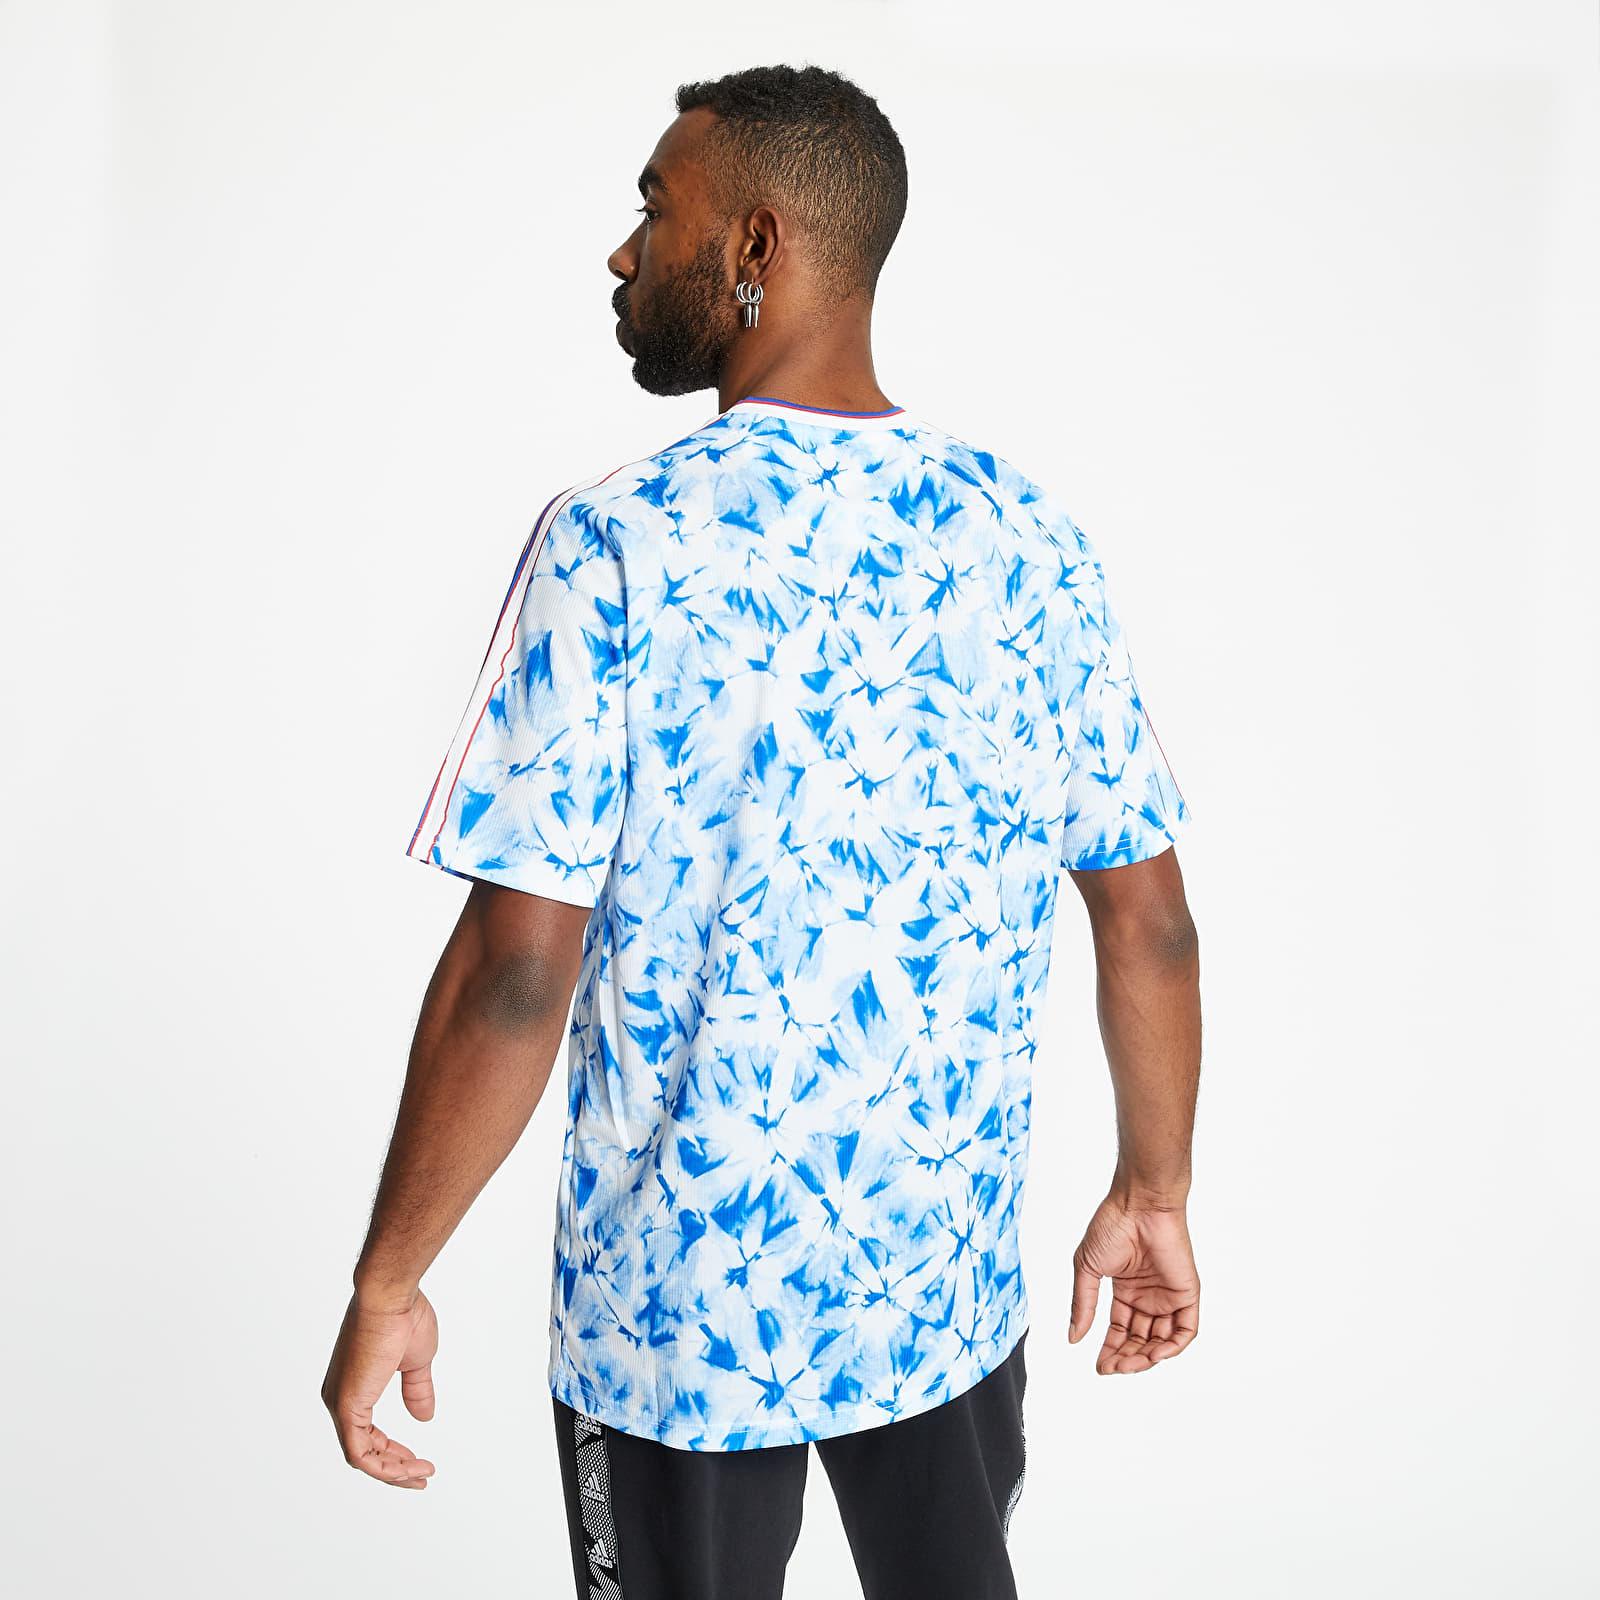 T-shirts adidas Manchester United Human Race Jersey White/ Bold Blue